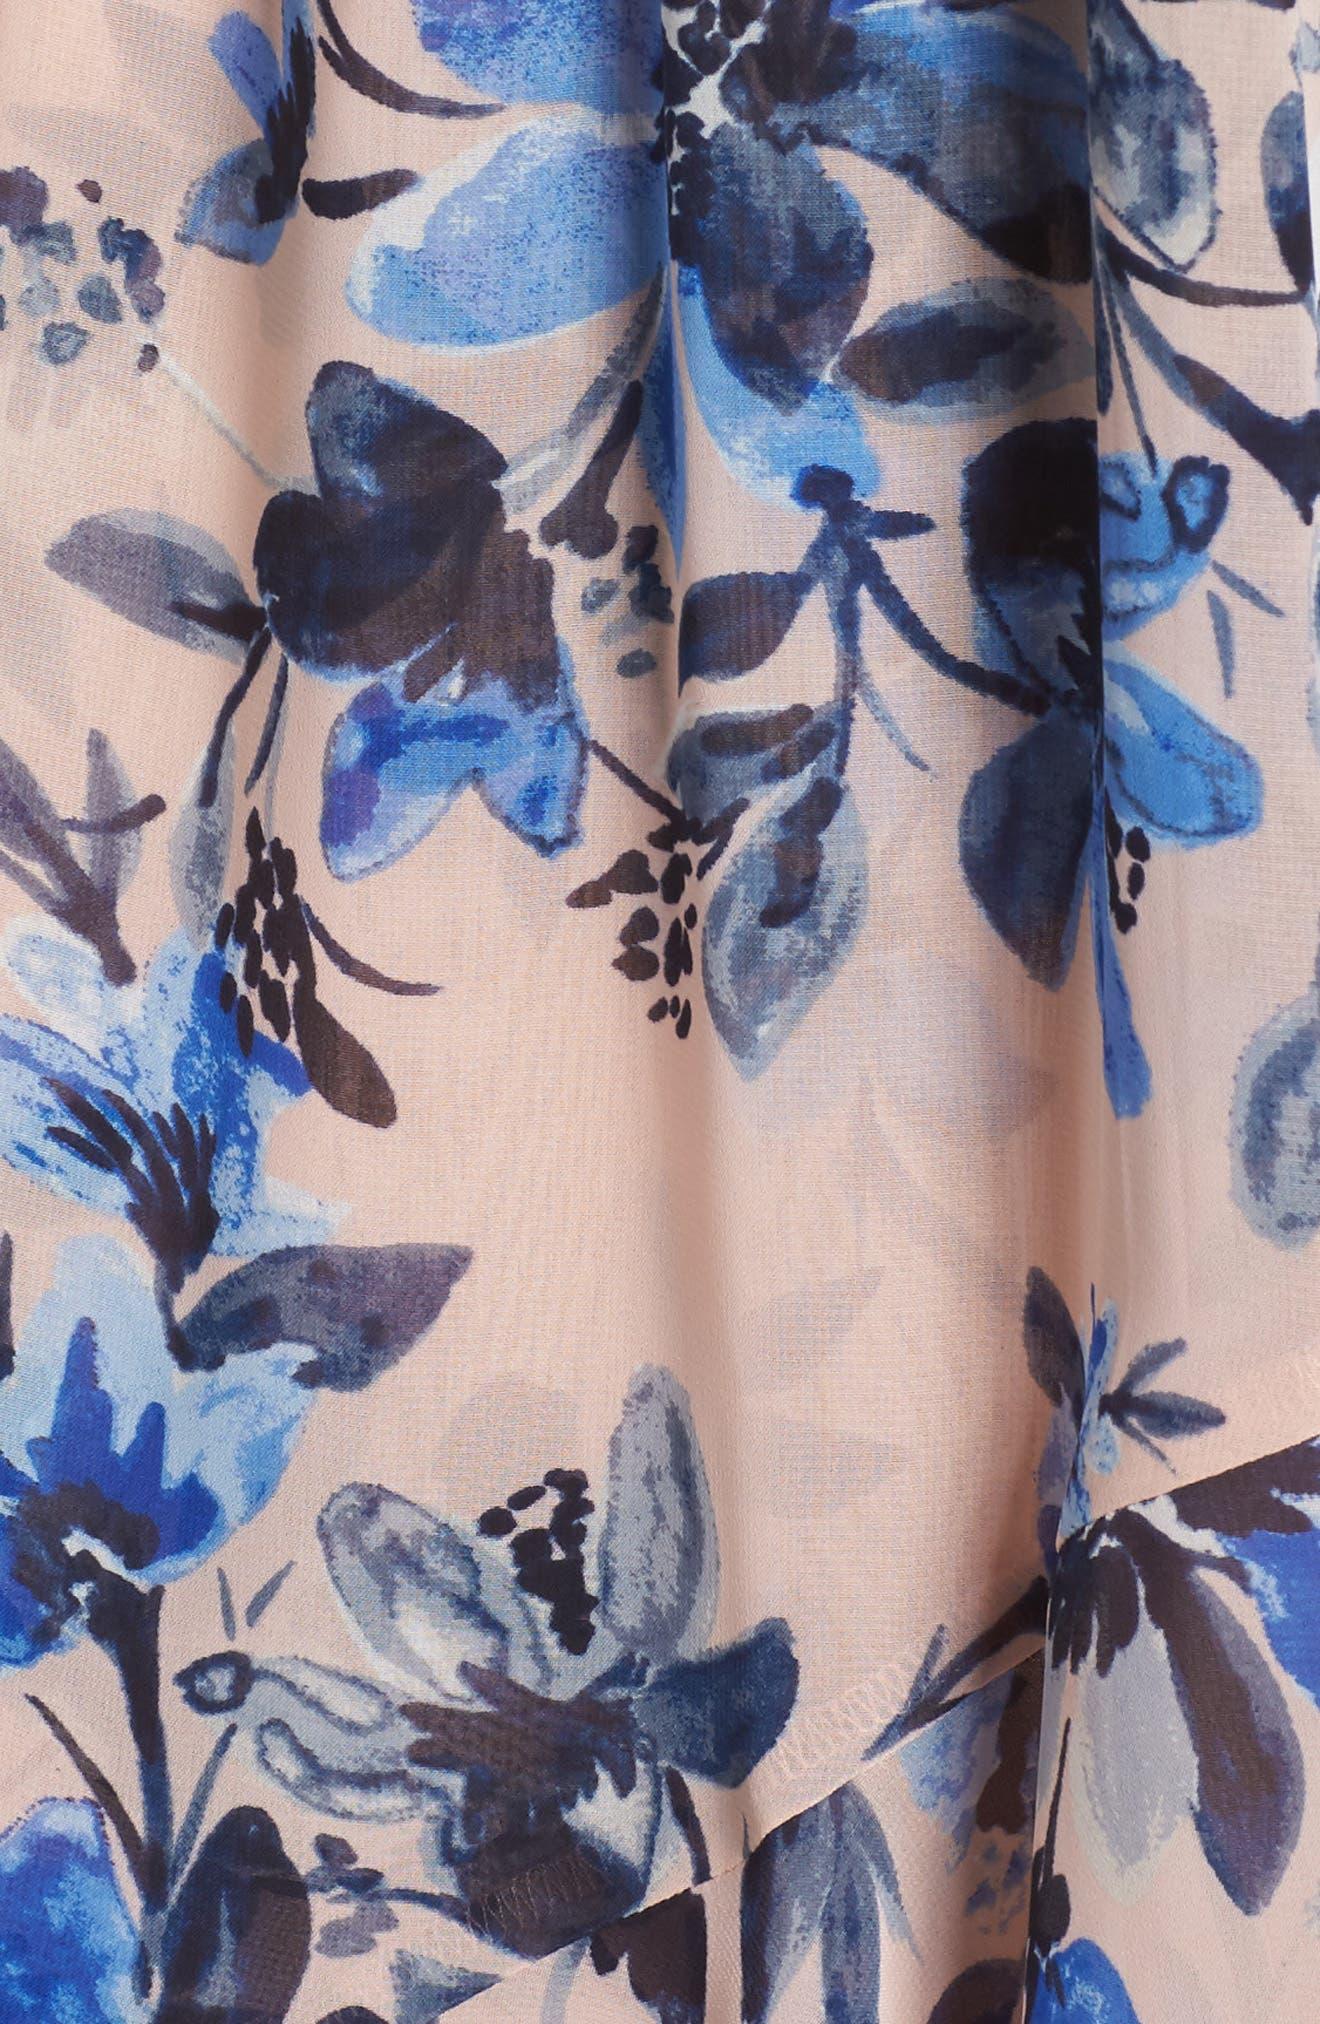 Sleeveless High/Low Dress,                             Alternate thumbnail 5, color,                             Blush/ Blue